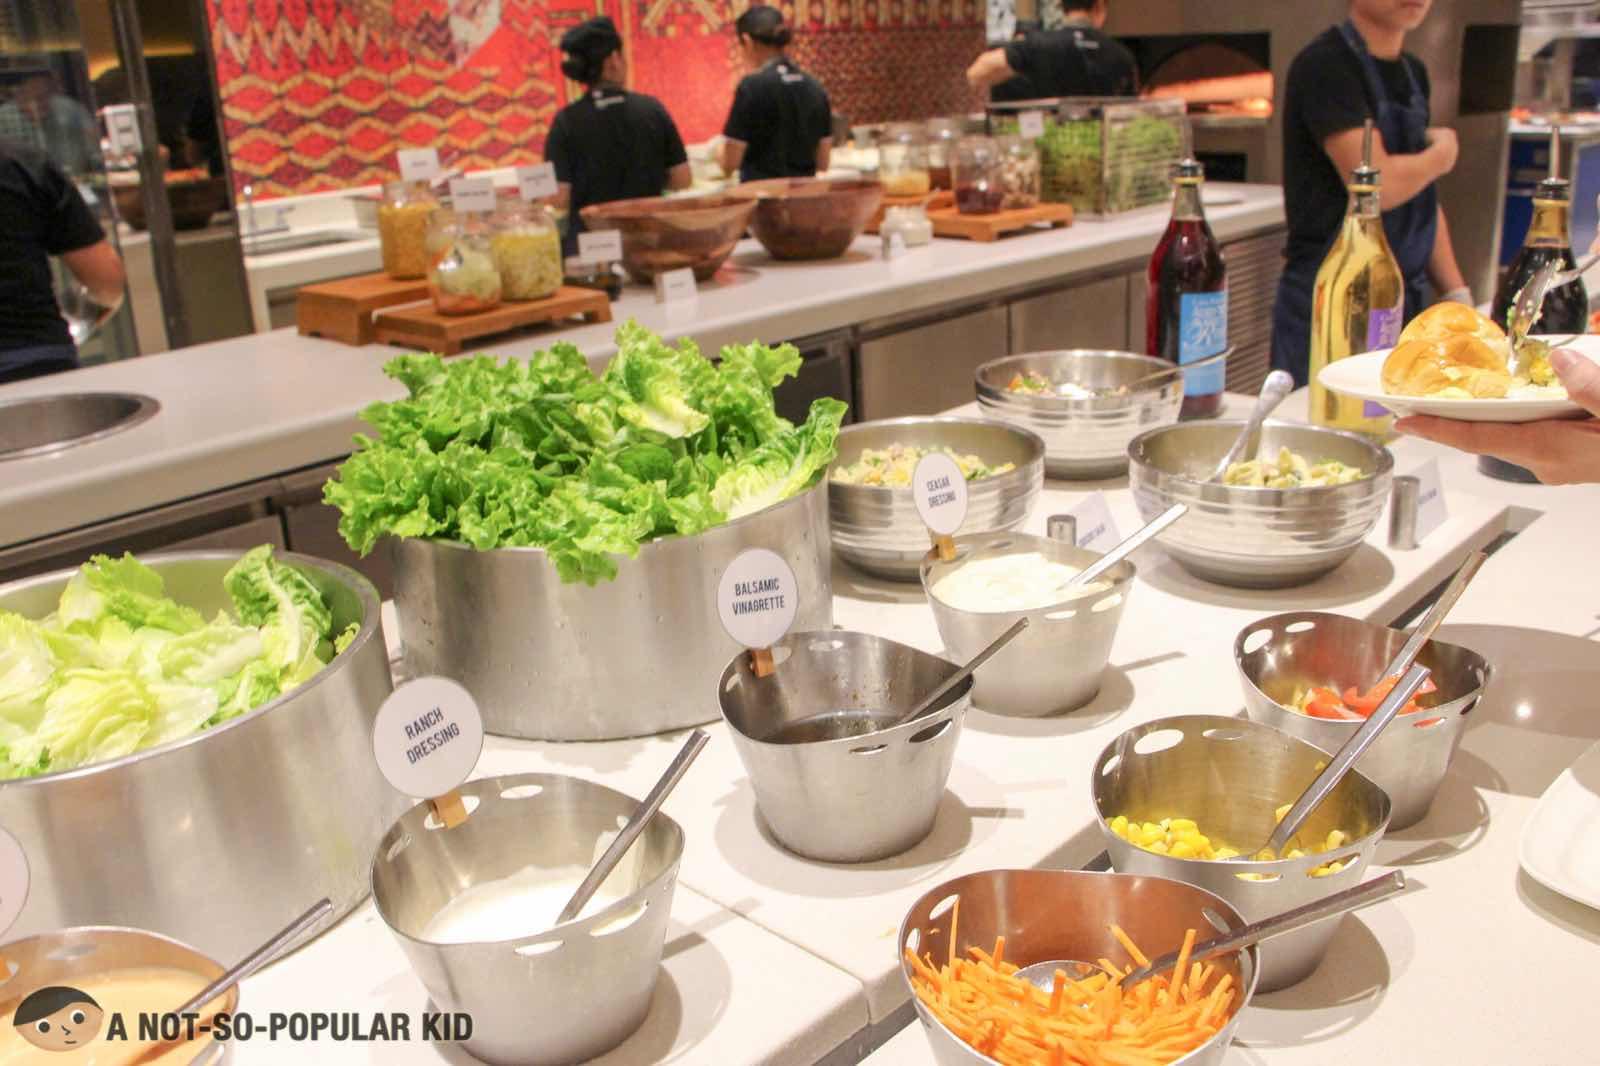 Salad Station of S Kitchen, Sheraton Hotel